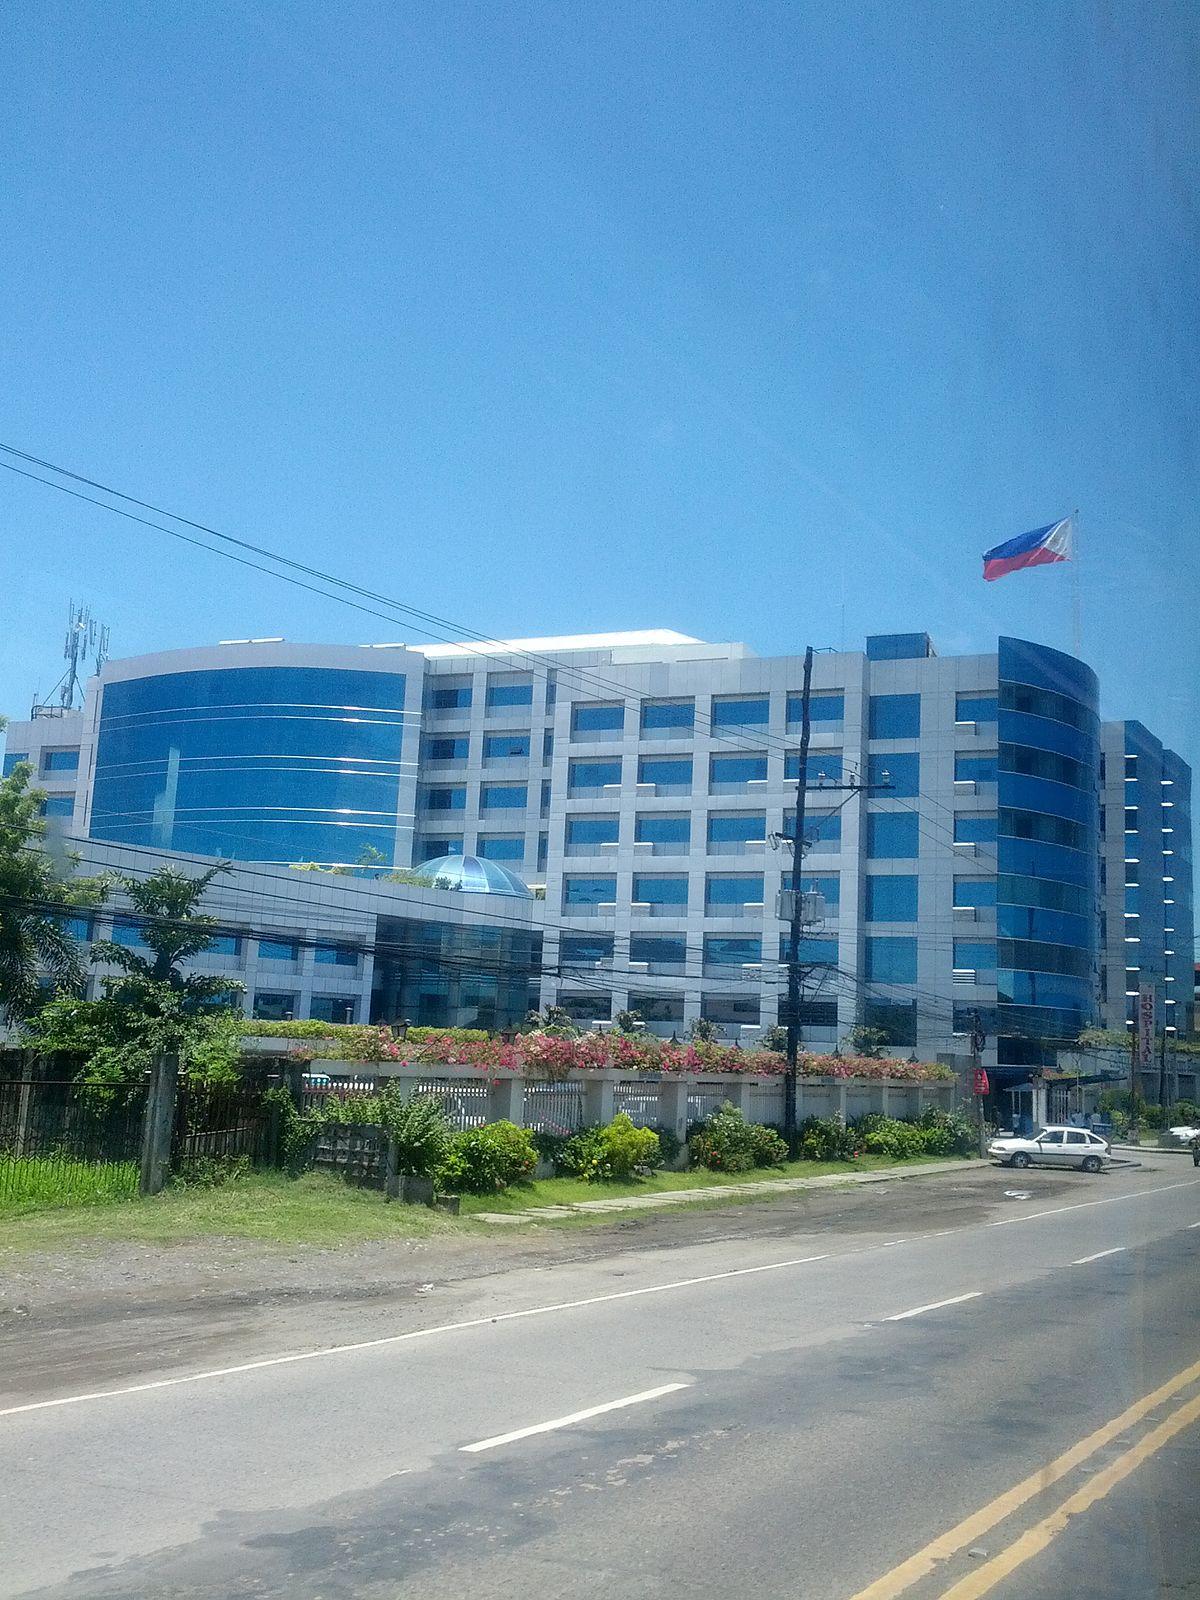 Capitol University Medical City  Wikipedia